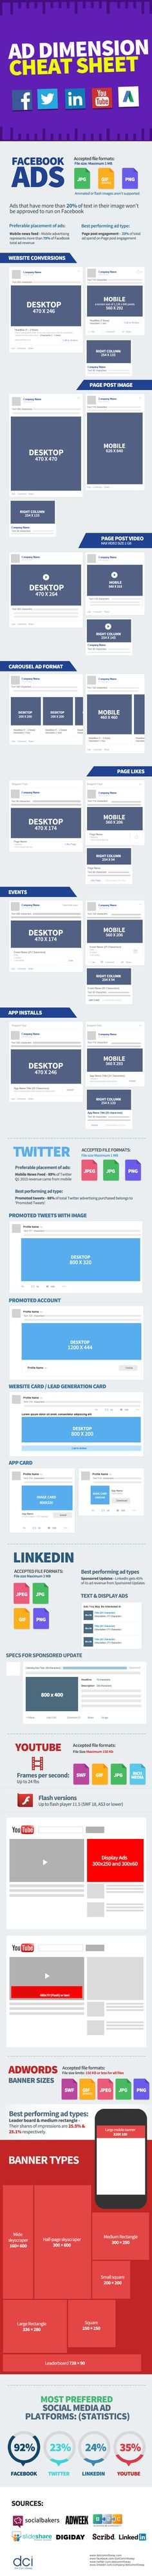 Facebook, Google Adwords, YouTube, Twitter, LinkedIn: Social Media Ads Cheat Sheet - #infographic